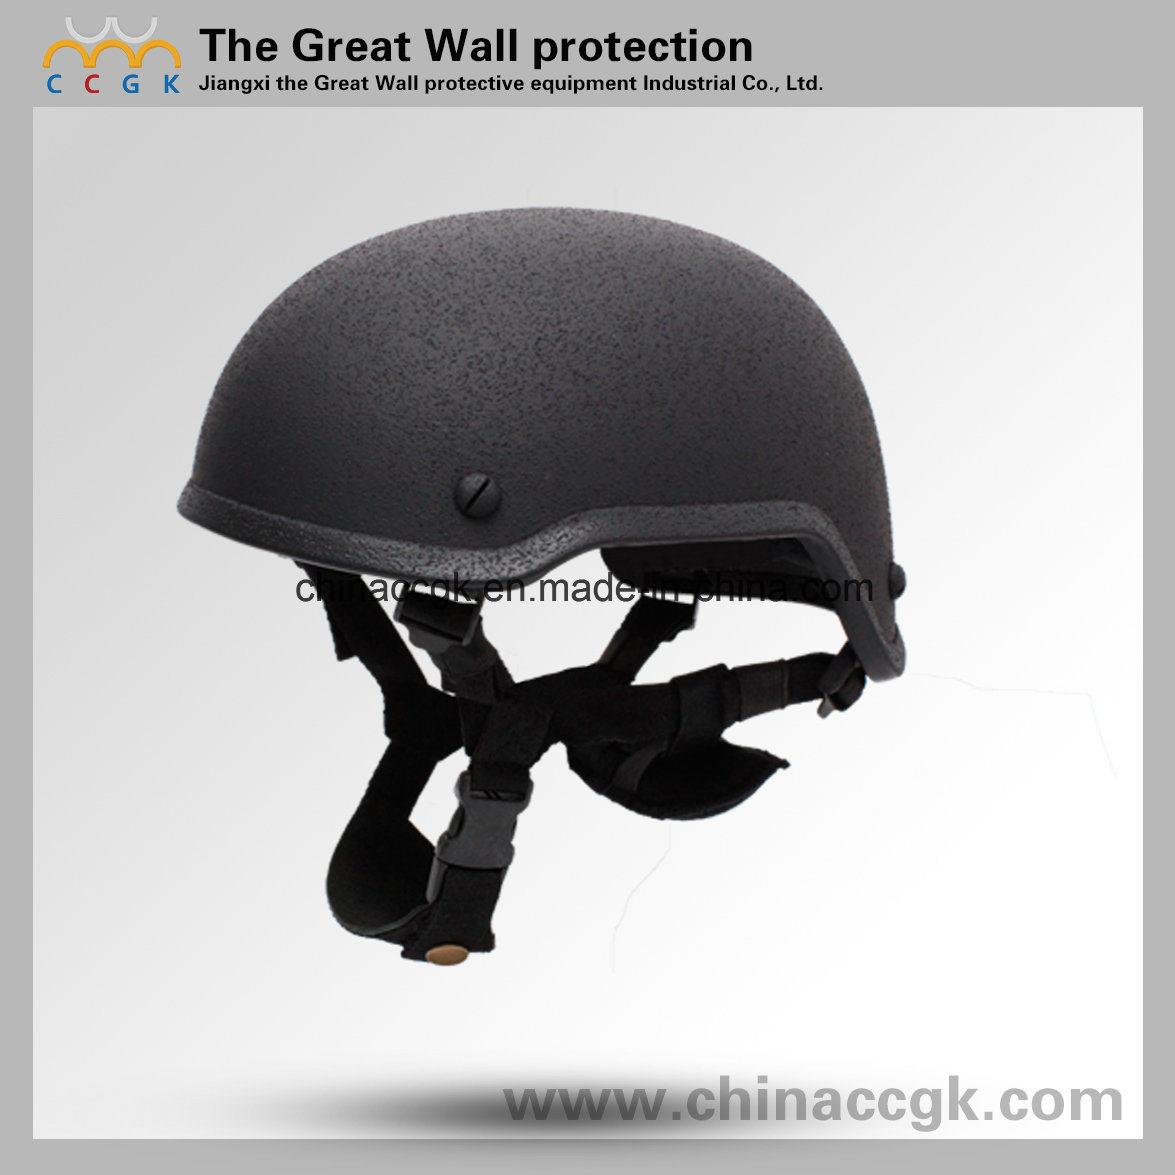 Ccgk Mich 2001 Anti-Riot Helmet